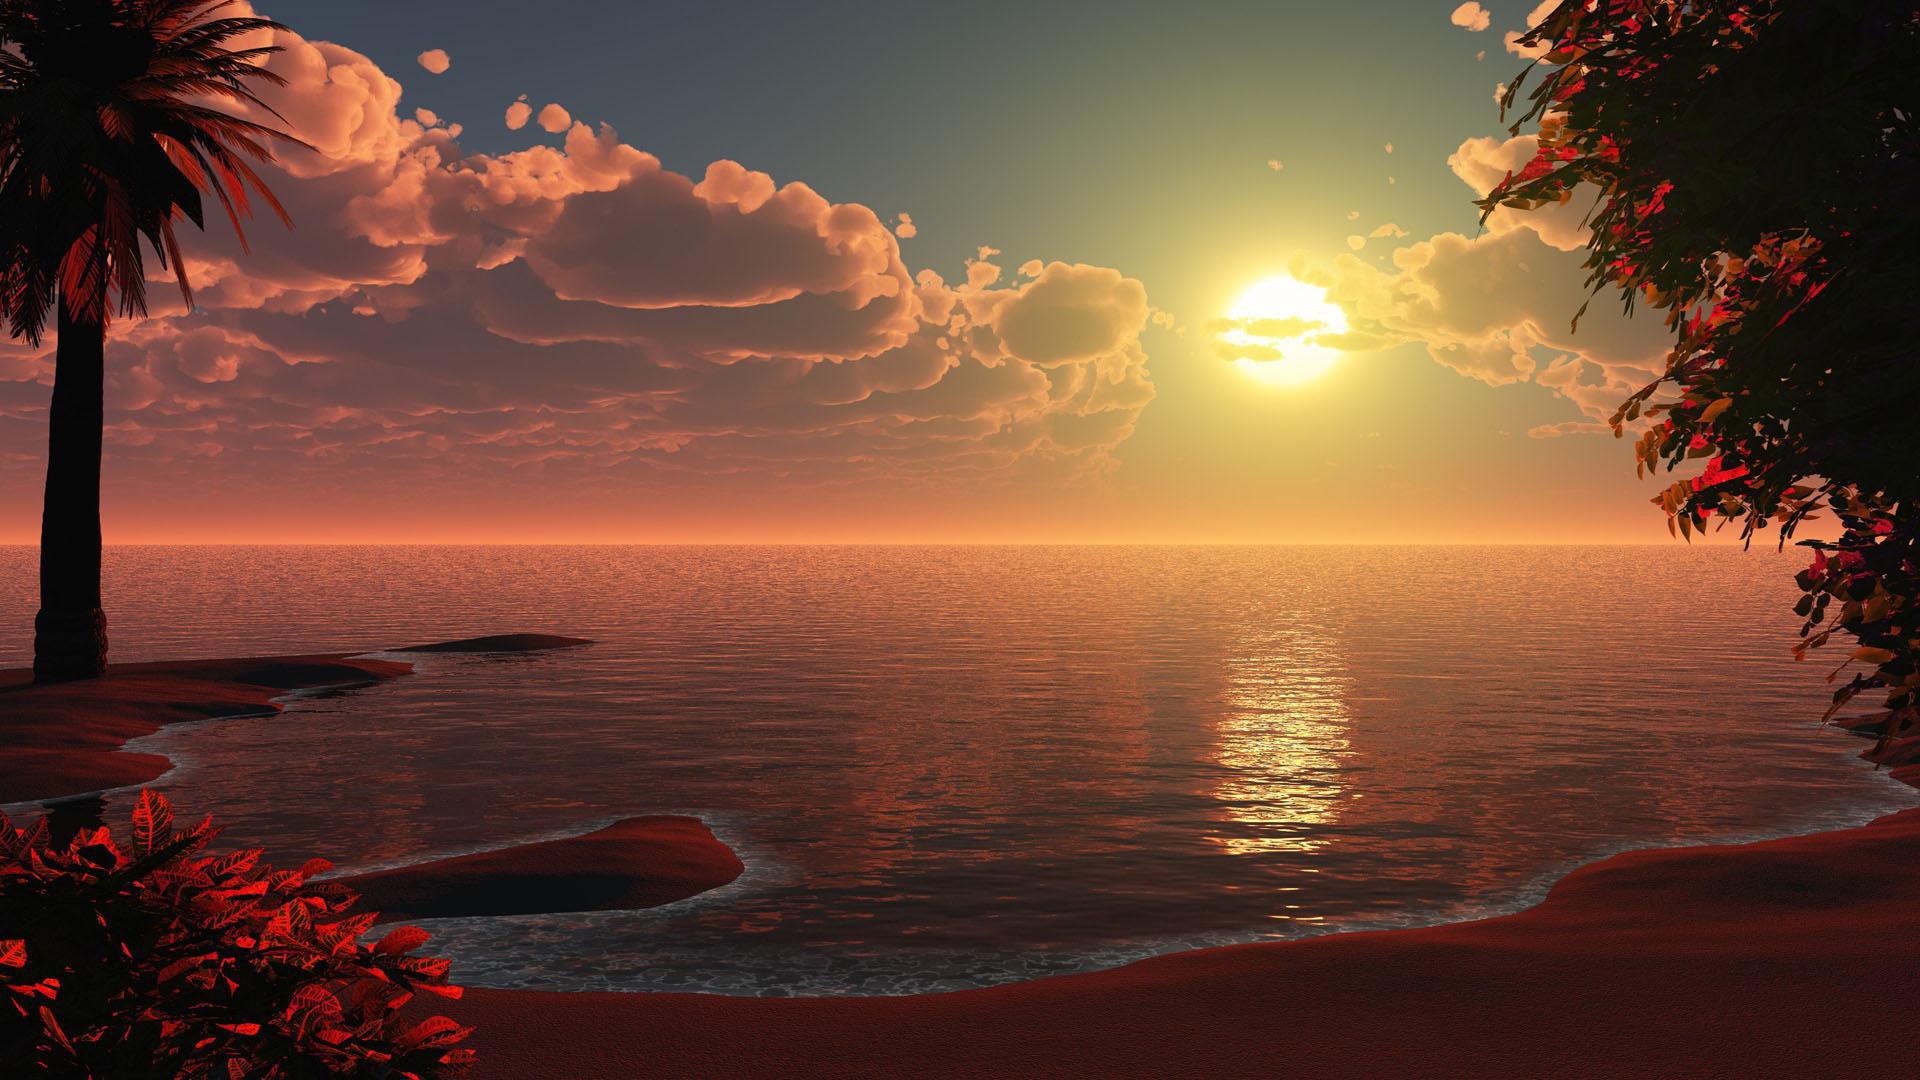 Iphone 6 Wallpaper Beach Tumblr Best Wallpaper: 1080x1920 Beautiful Beach Sunset Artwork Iphone 7,6s,6